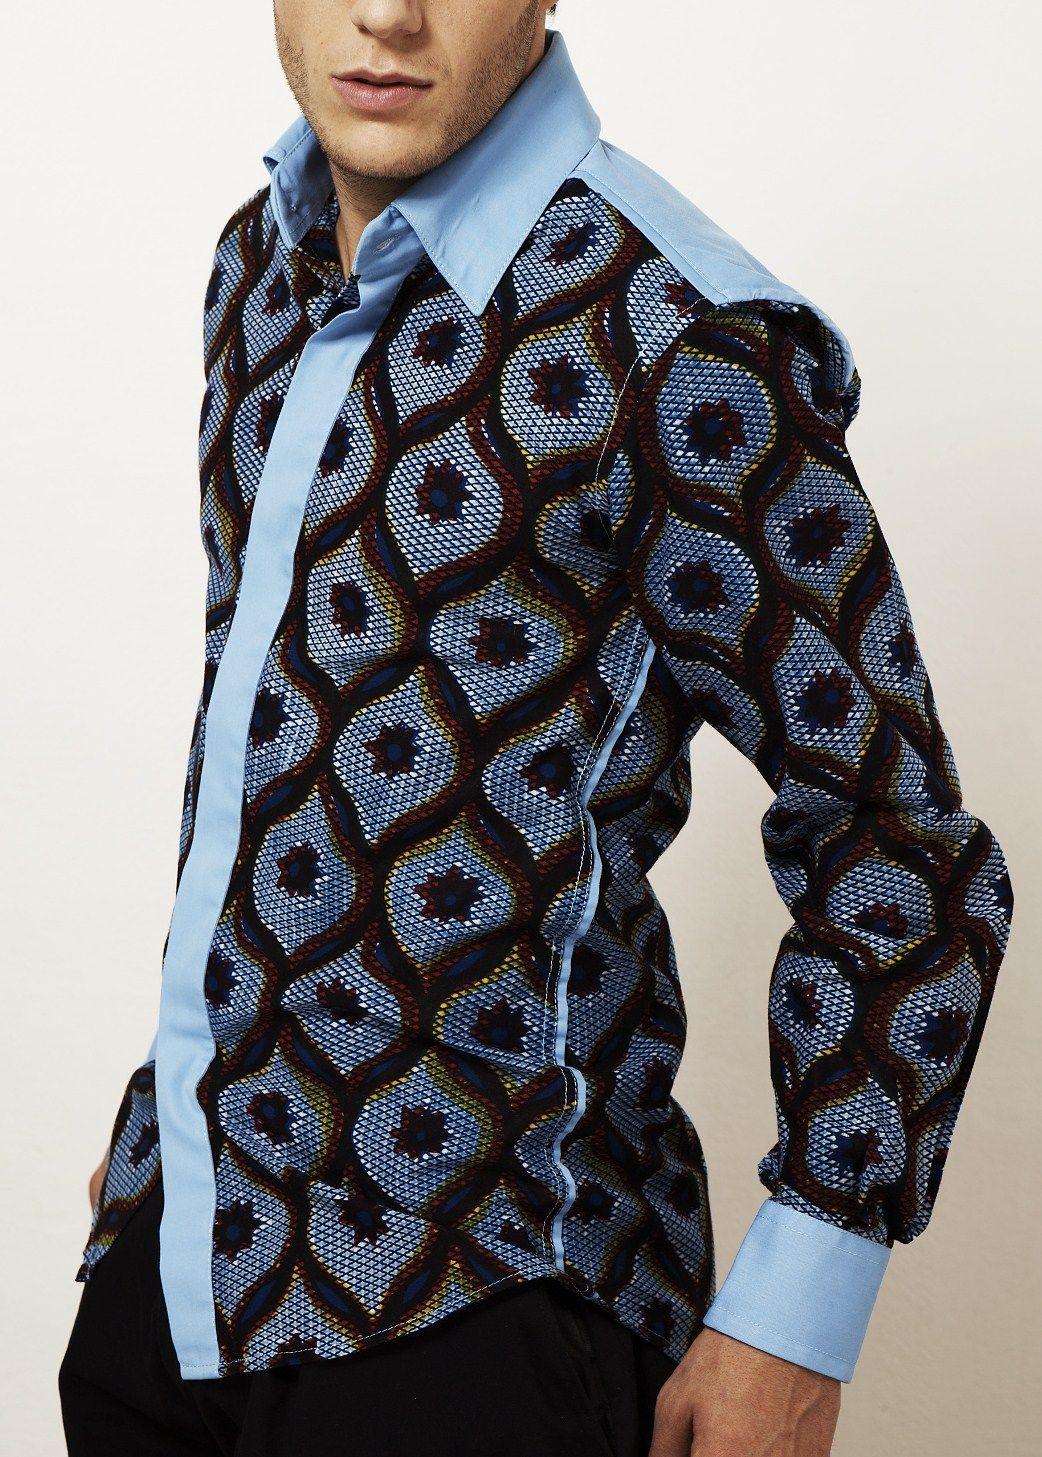 Shirts | Kévé | African men fashion, African clothing for men, African shirts for men